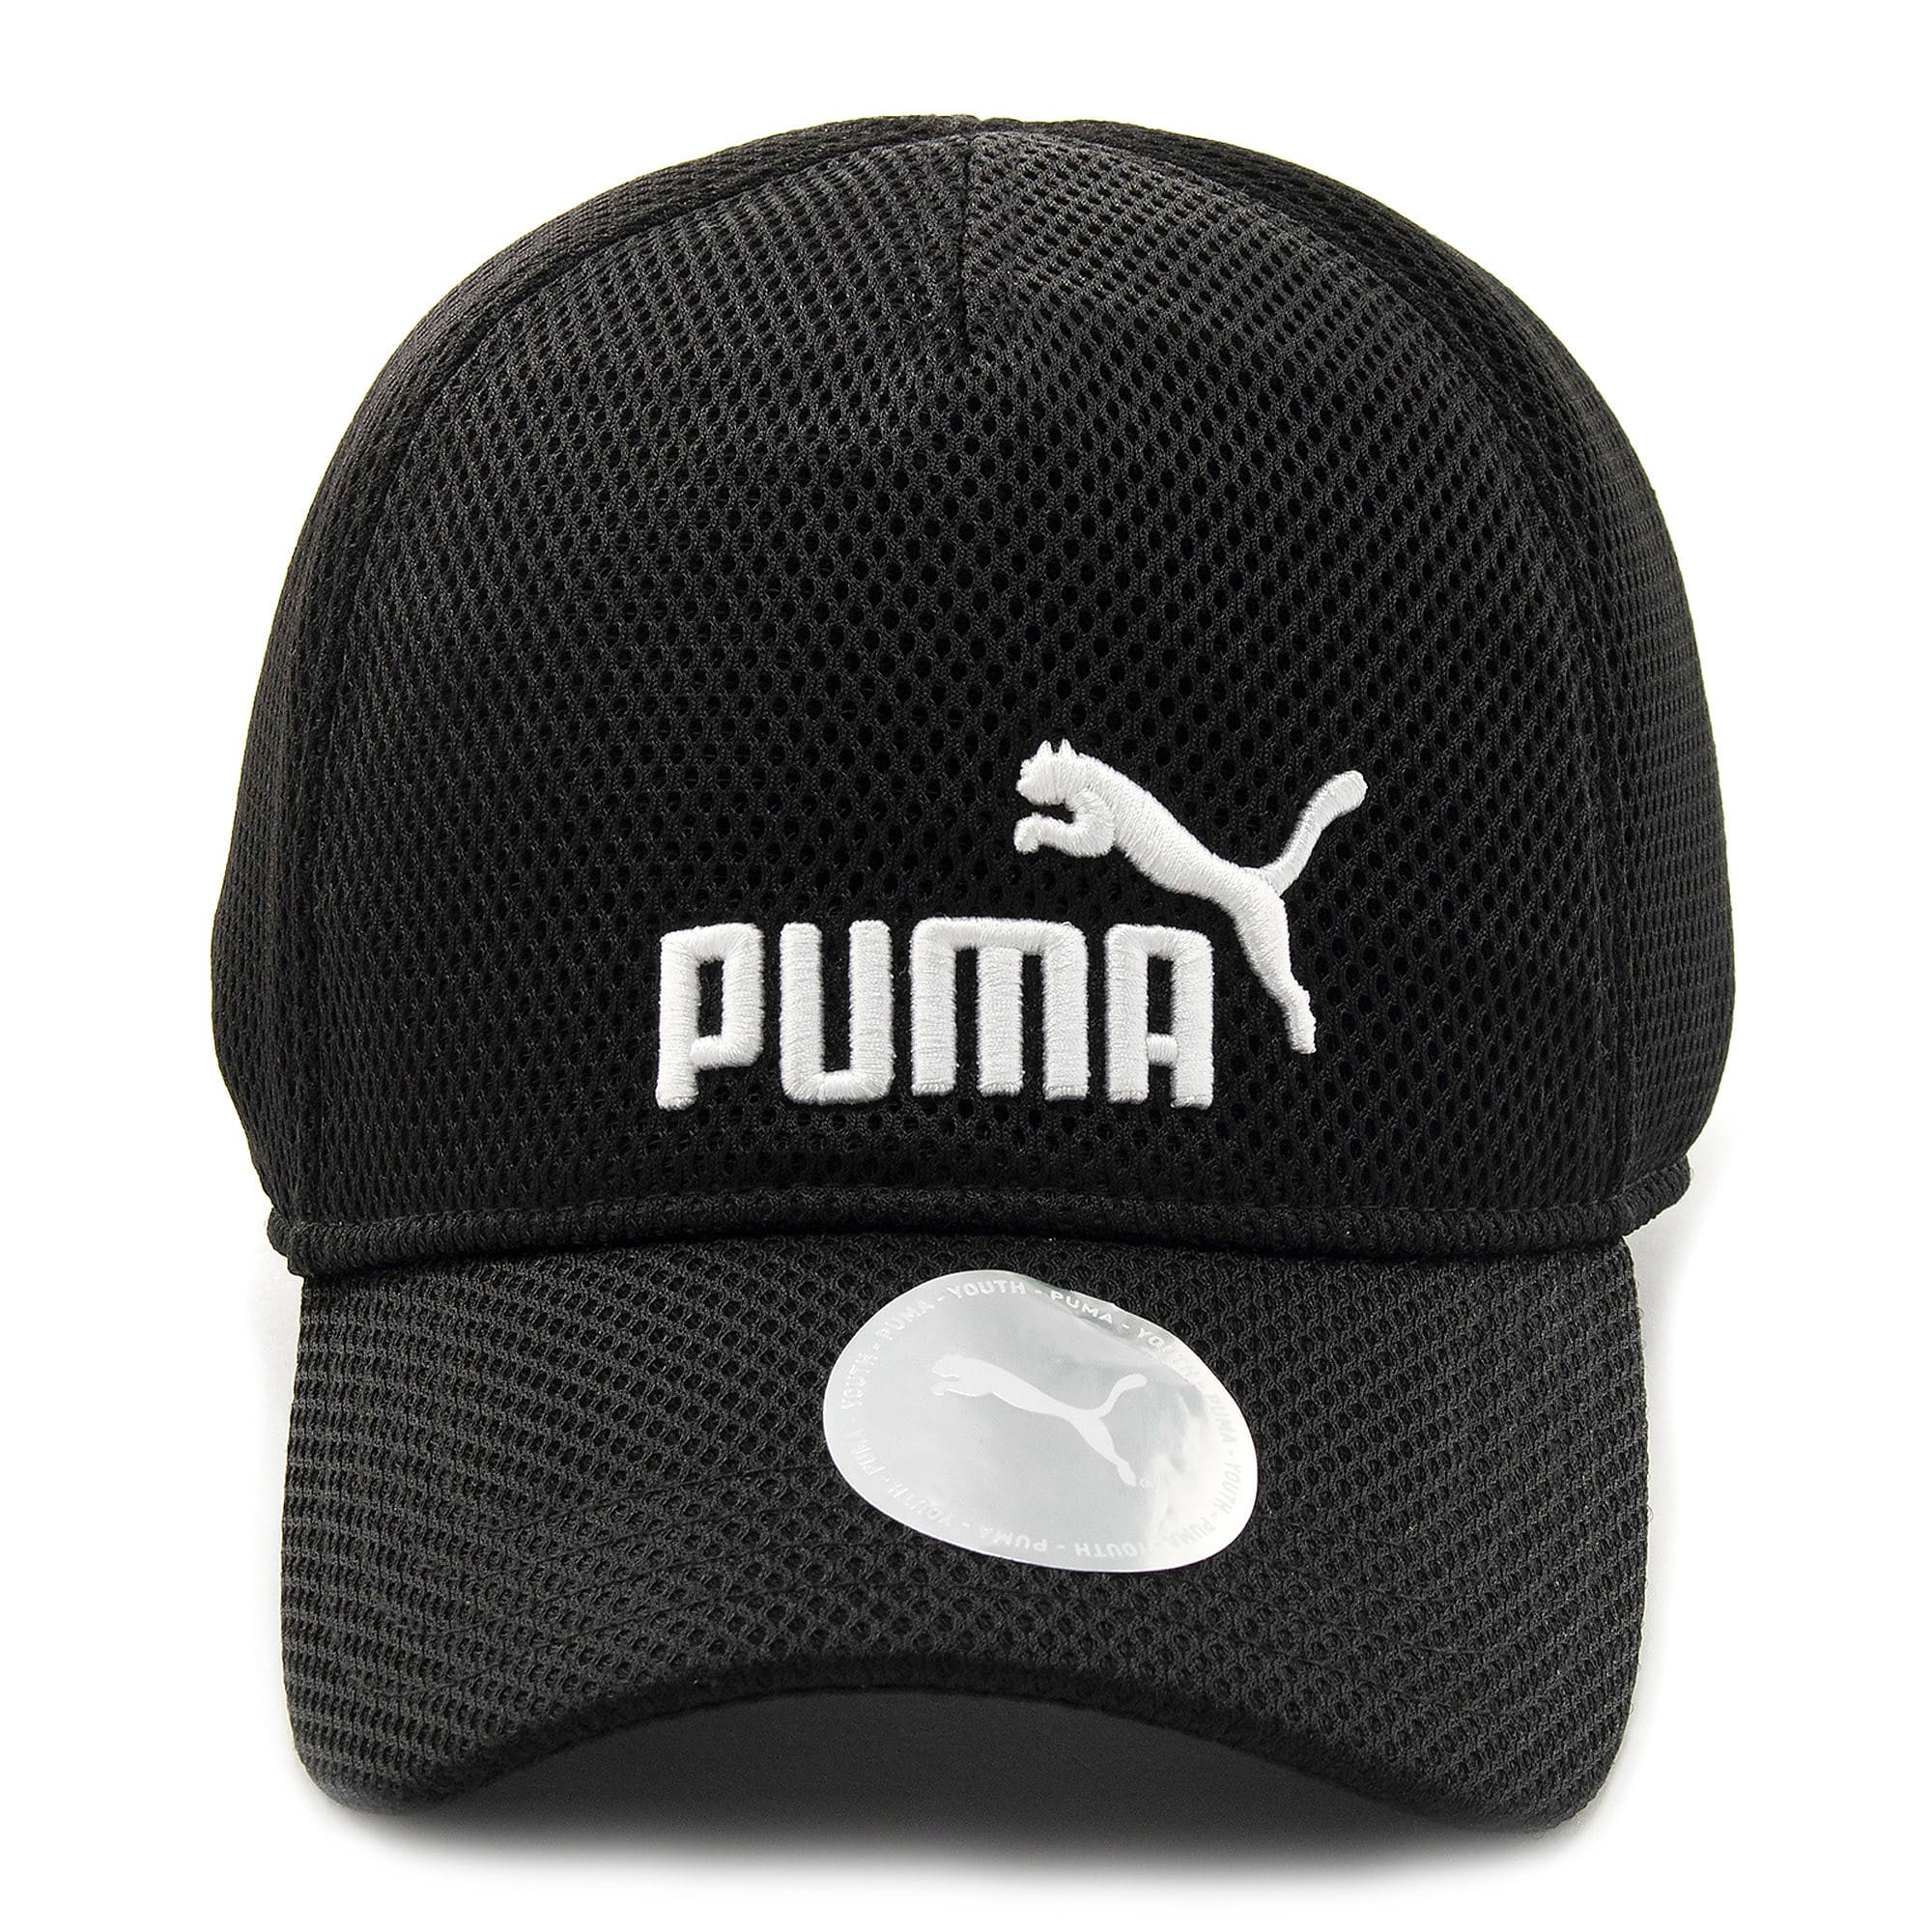 Thumbnail 4 of キッズ トレーニング メッシュ キャップ JR, Puma Black-No 1, medium-JPN